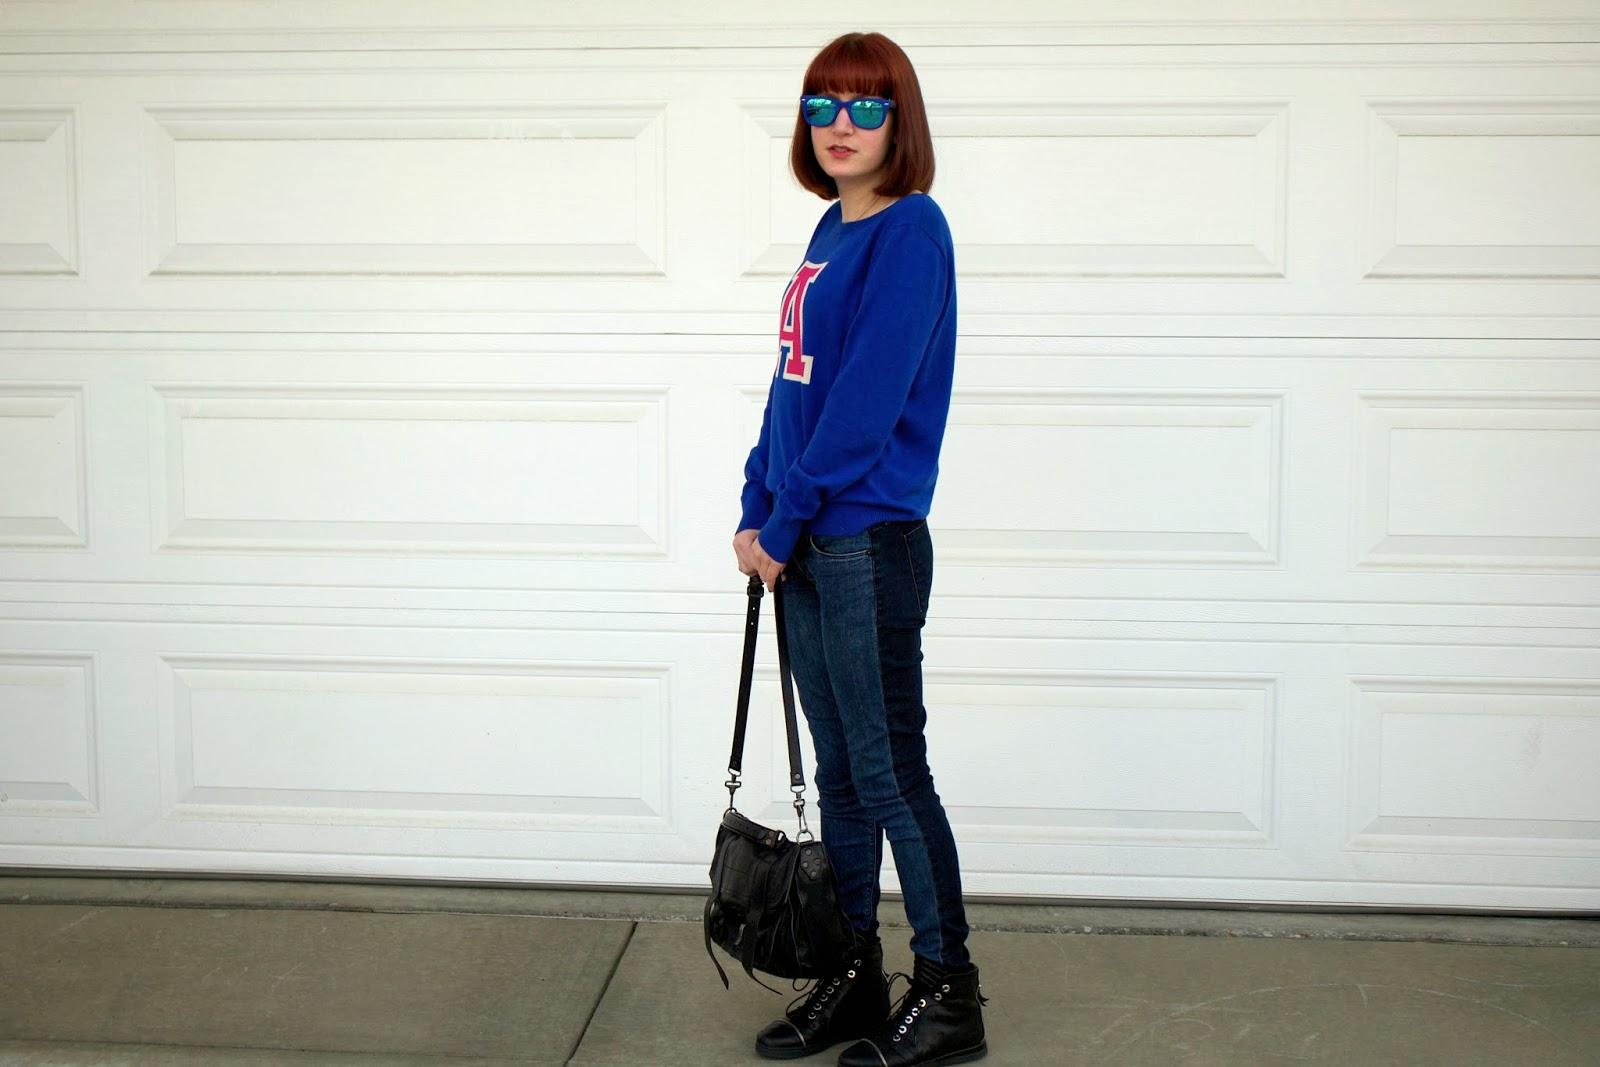 monogram sweater, letter sweater, hudson jeans, mirrored ray-bans, stuart weitzman zipit, ps1